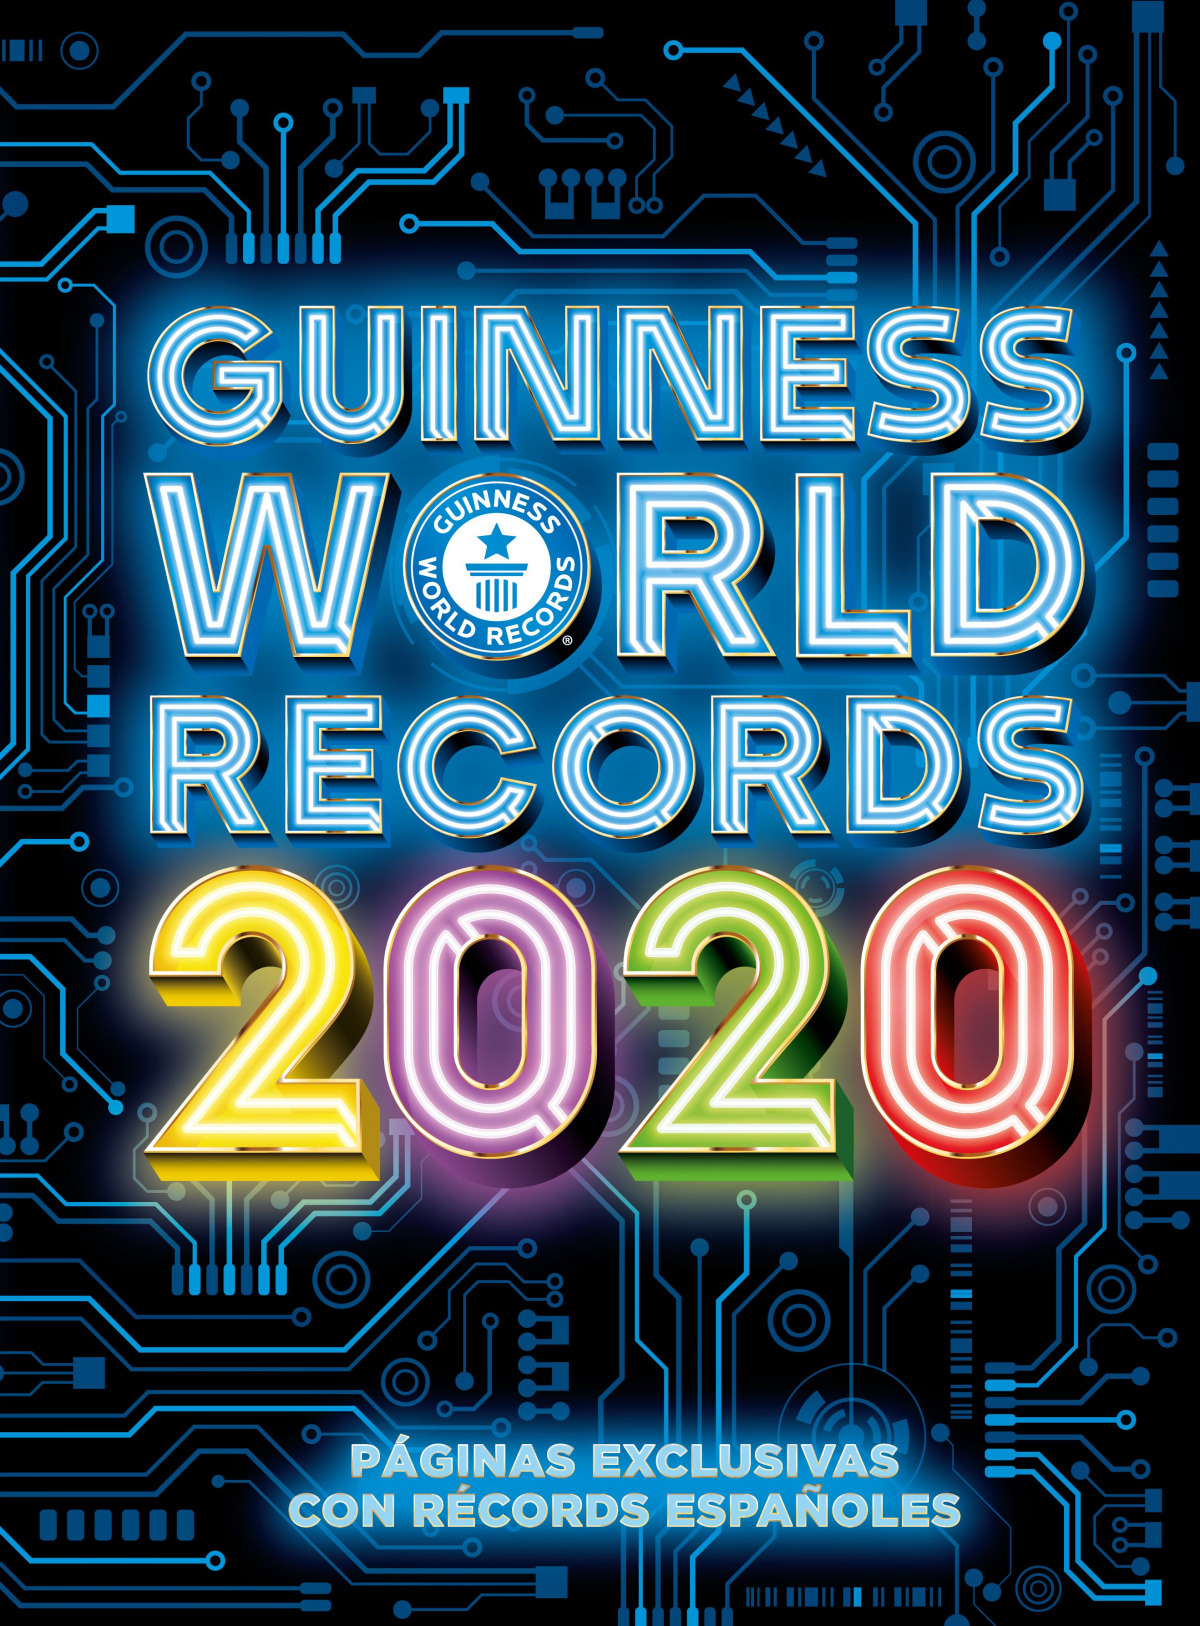 GUINNESS 2020 WORLD RECORDS 9788408212904